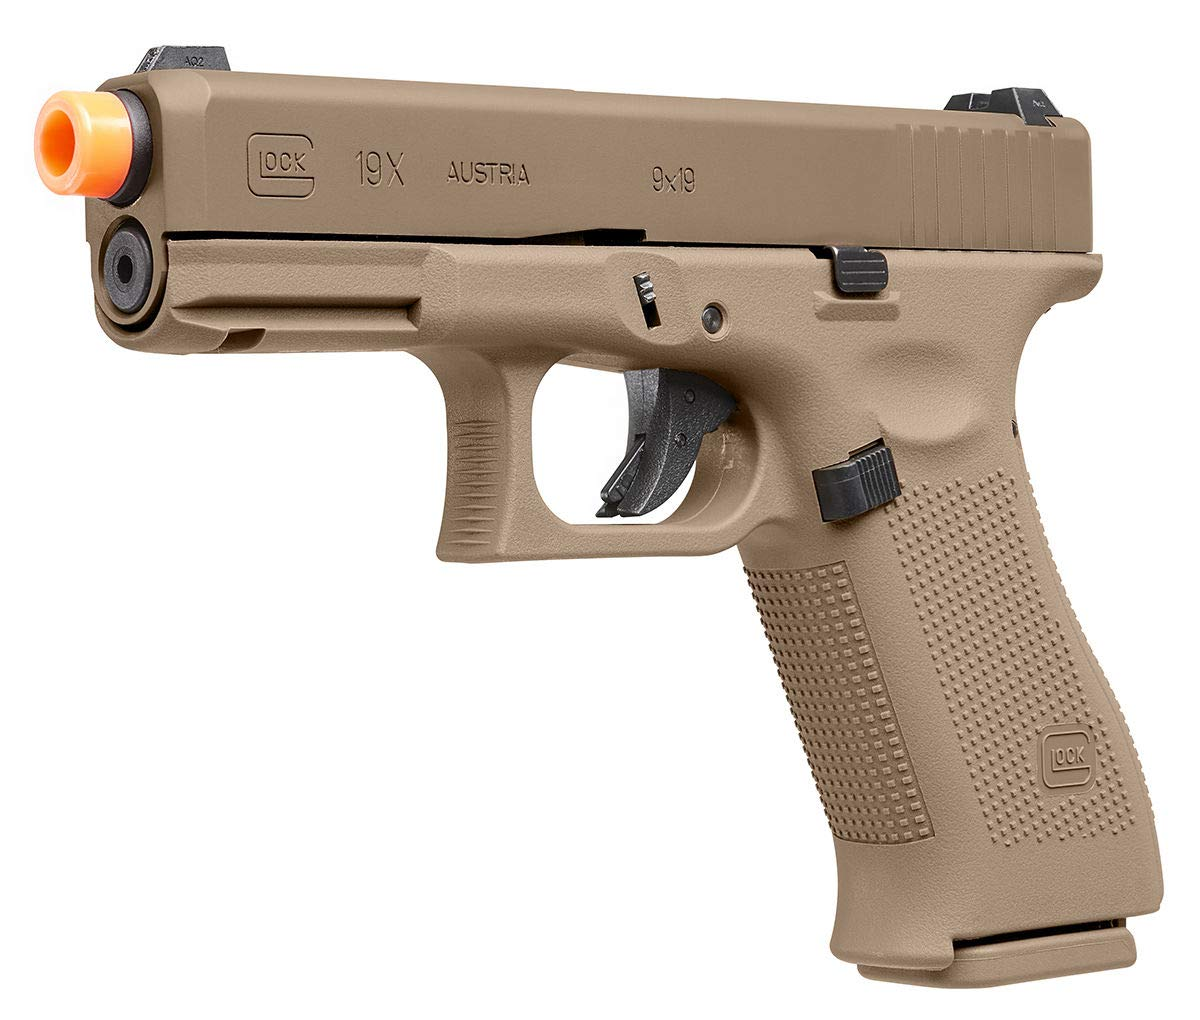 Umarex Glock 19X GBB Blowback 6mm BB Pistol Airsoft Gun, Glock 19X Airsoft Gun by Umarex